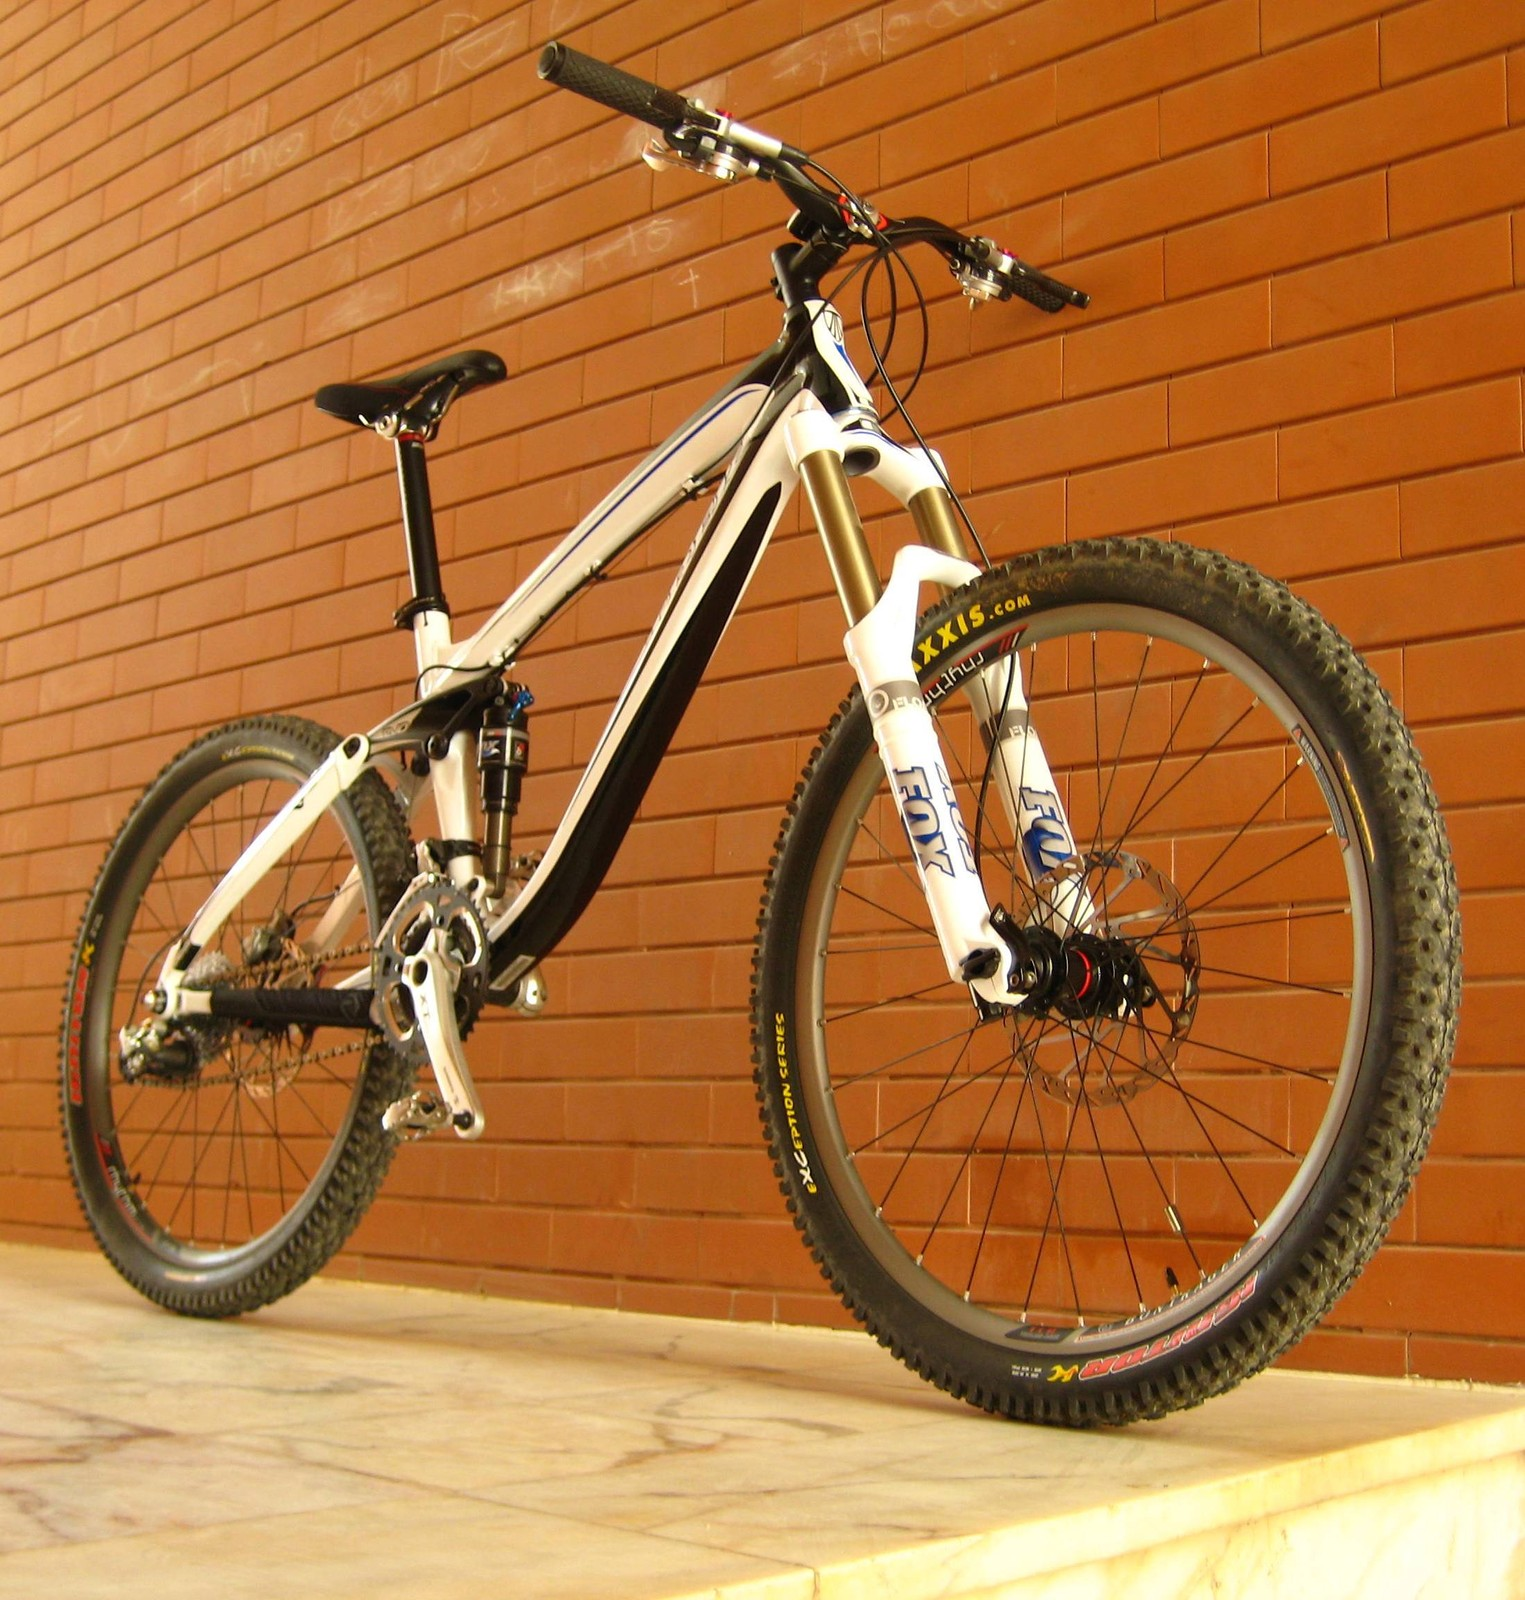 Trek Remedy 9 2008 - AMAddict Edition (1st one) - nunonobrega's Bike Check - Vital MTB